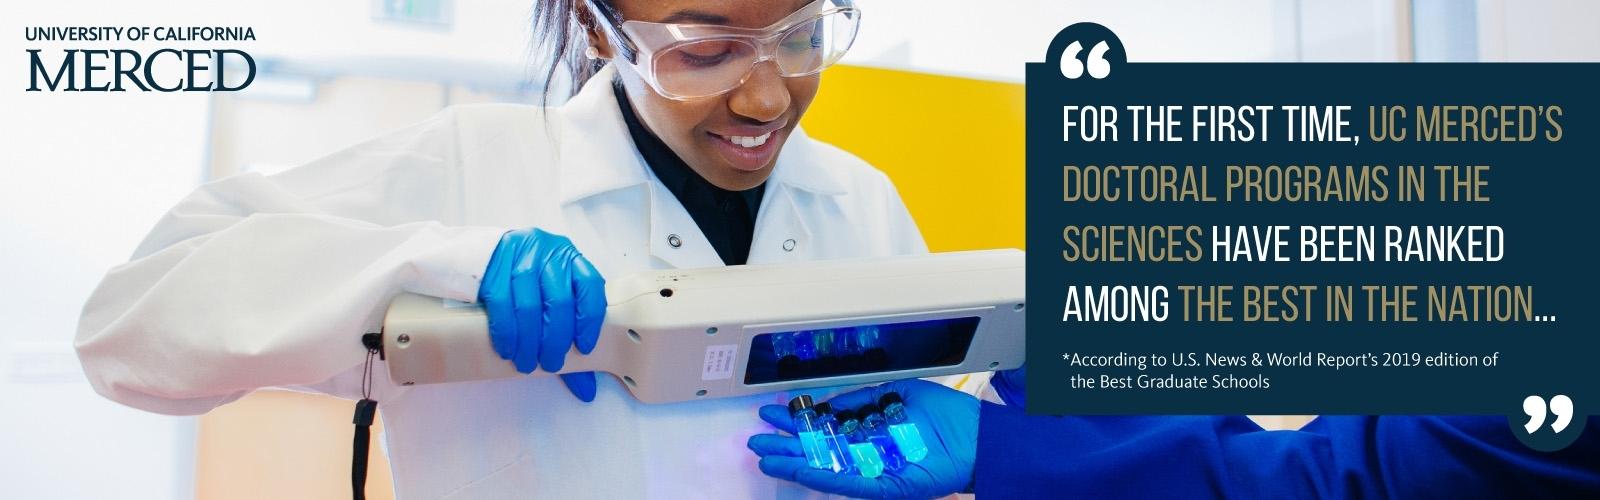 UC Merced graduate programs in sciences have debuted in national rankings